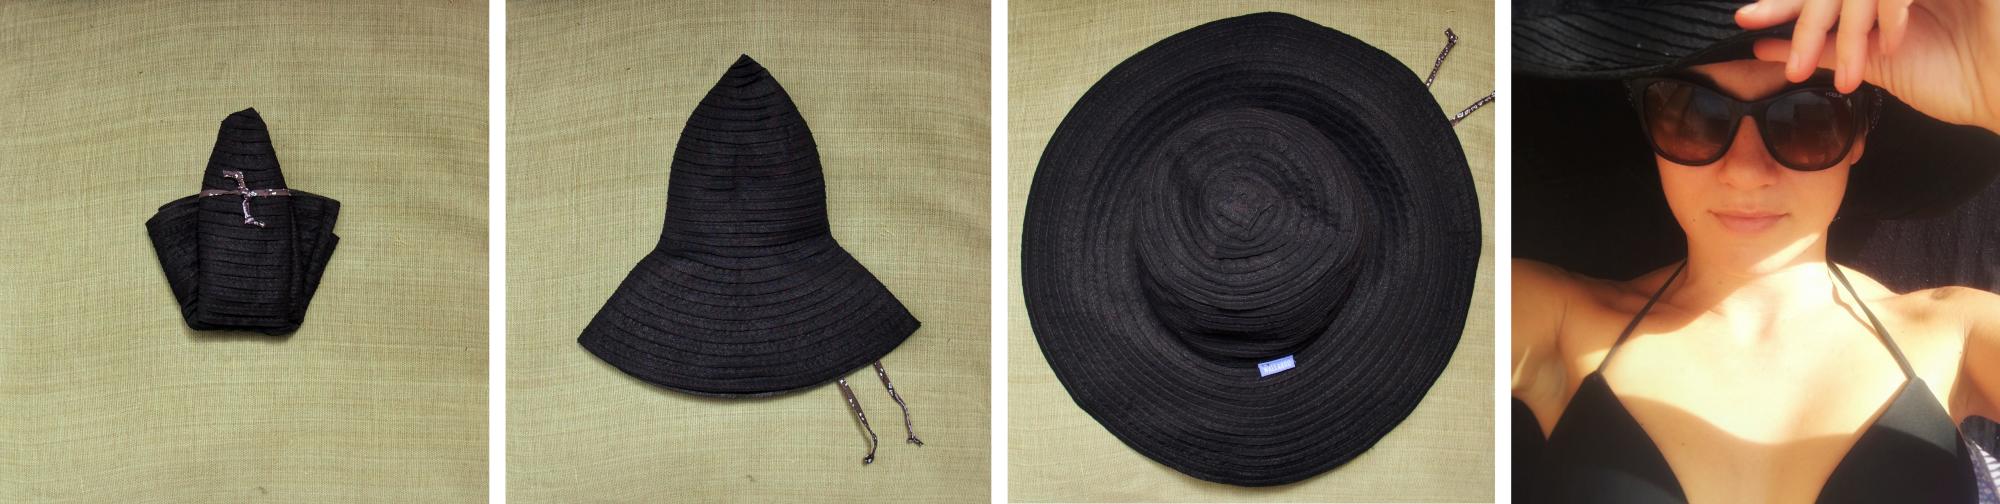 Wallaroo Collapsible Sun Hat